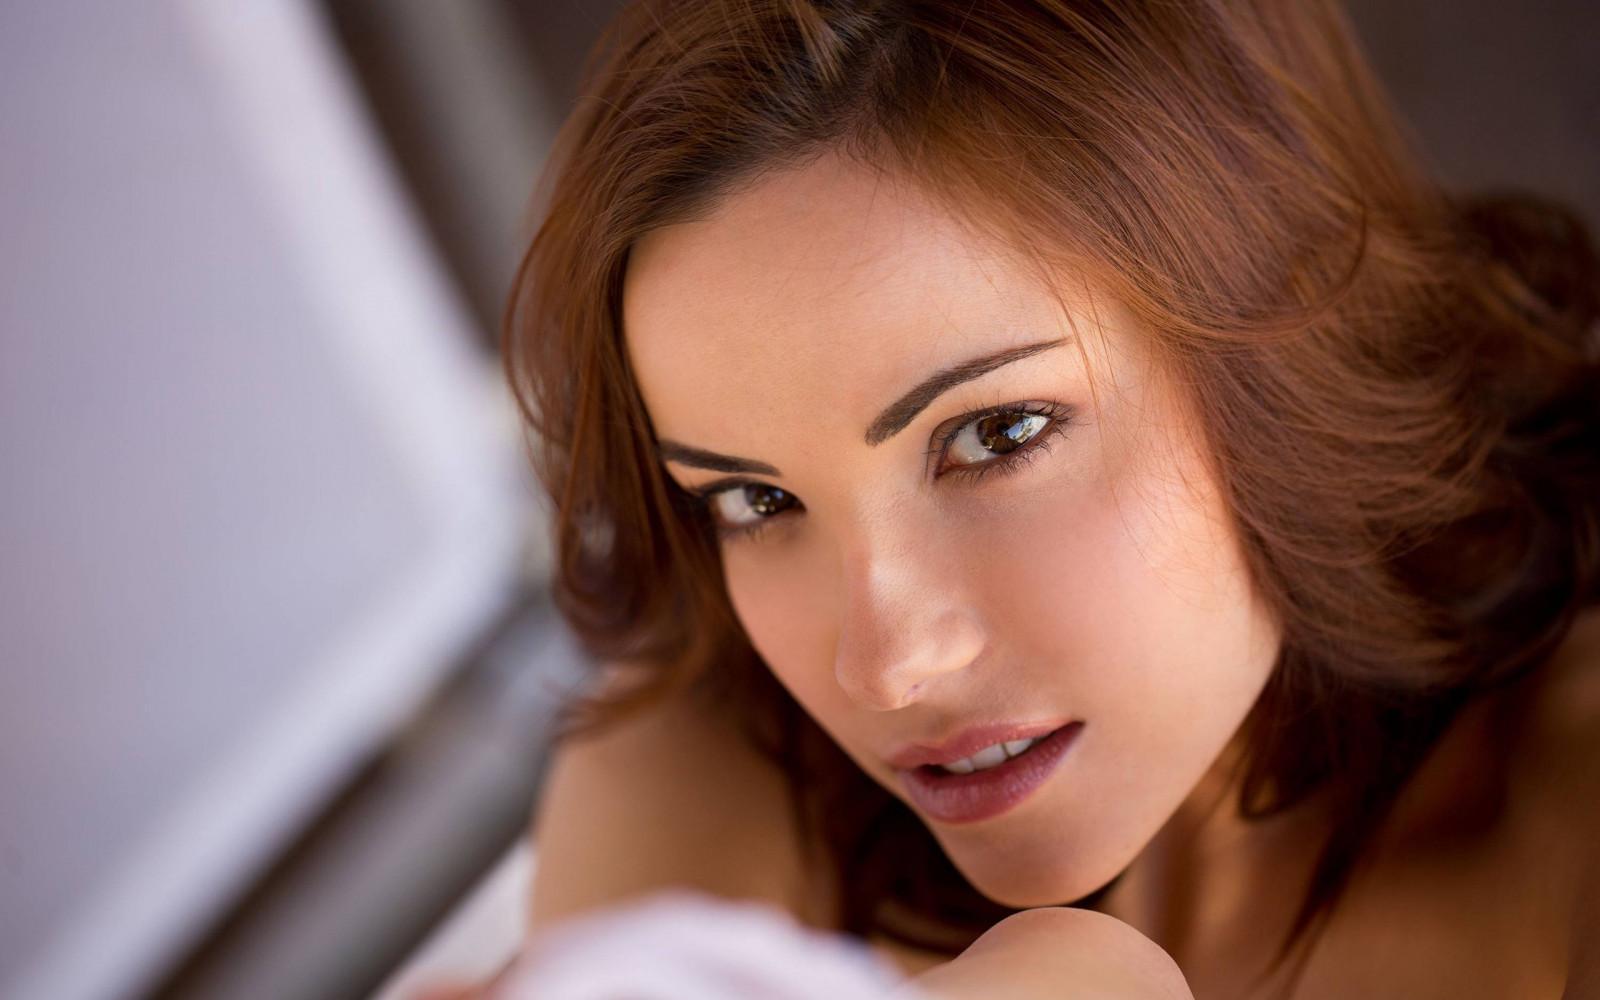 Wallpaper : model, brunette, long hair, women outdoors